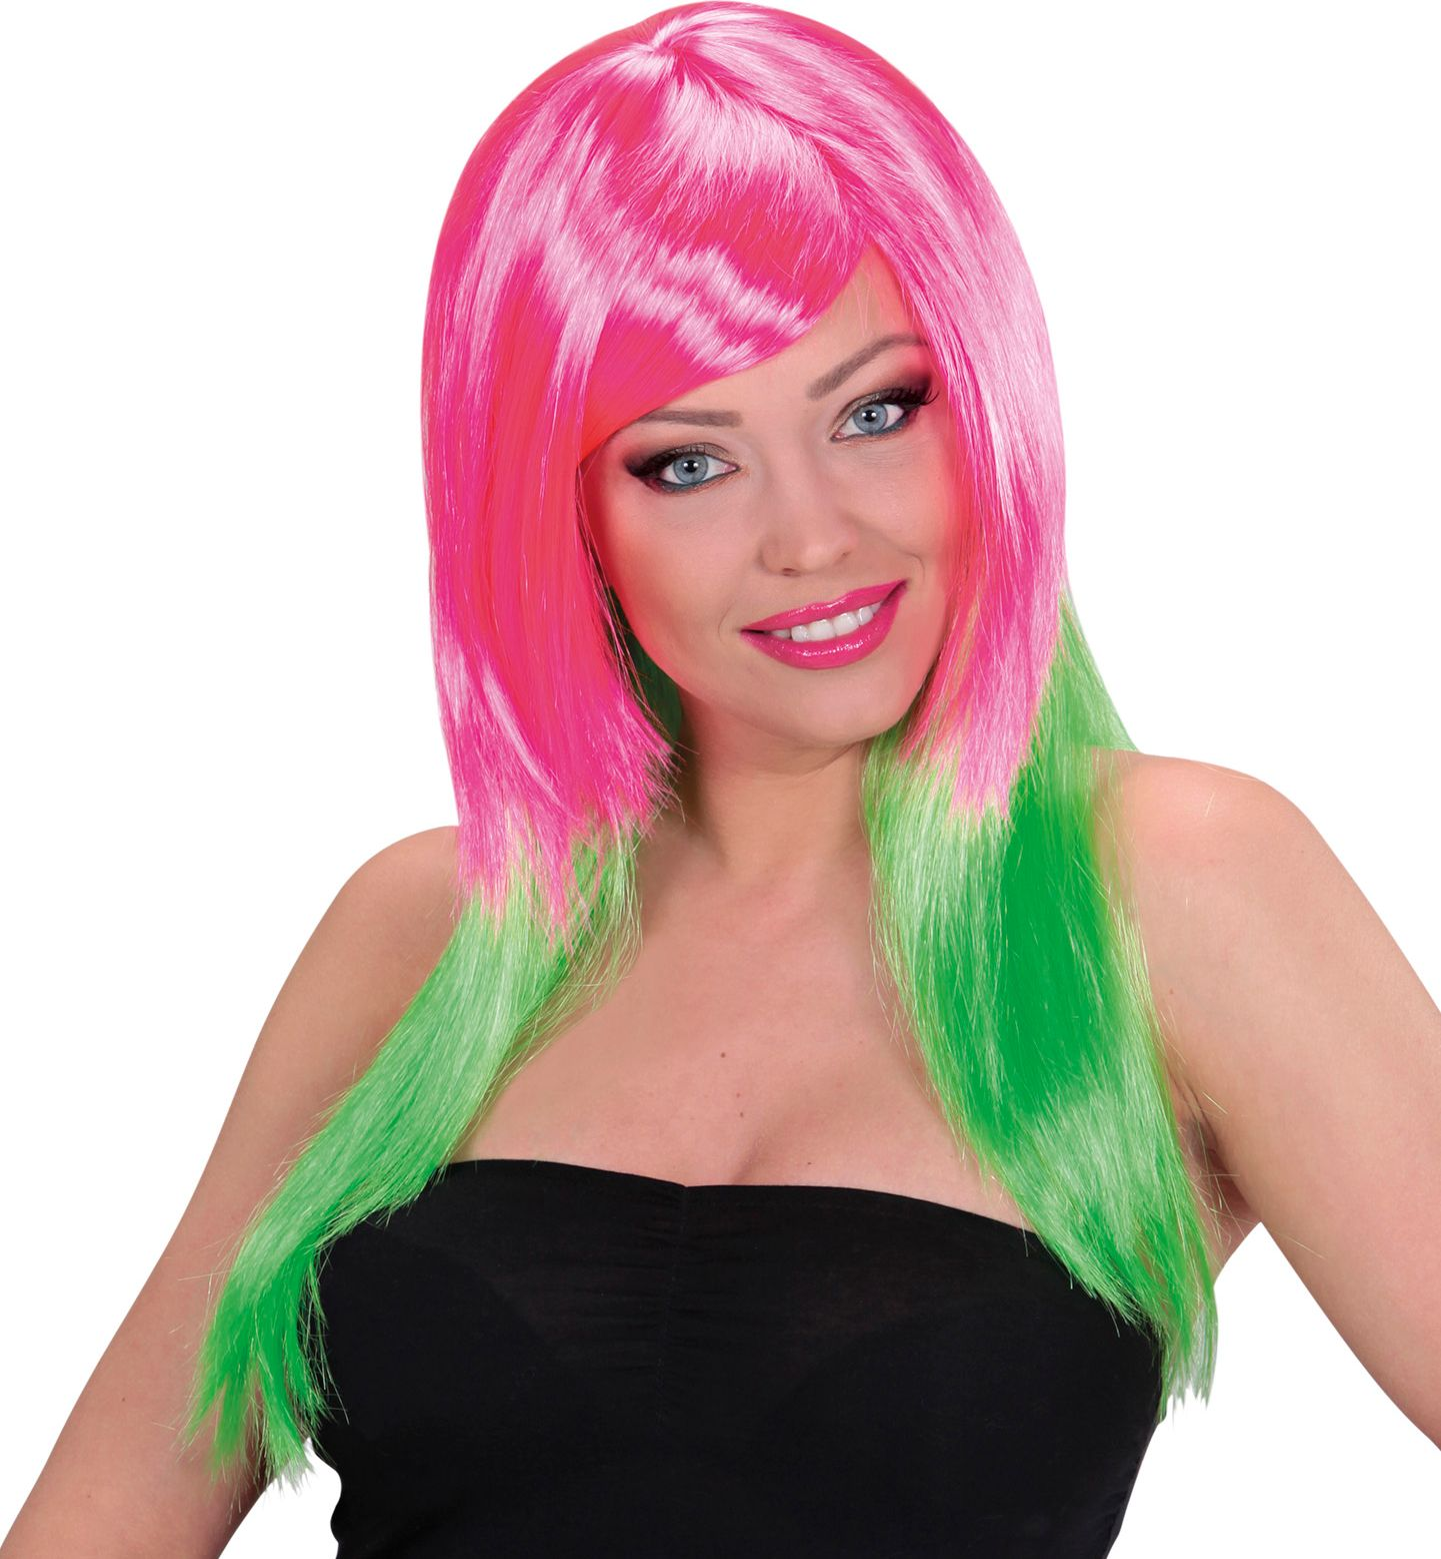 Roze-groene pruik lang haar